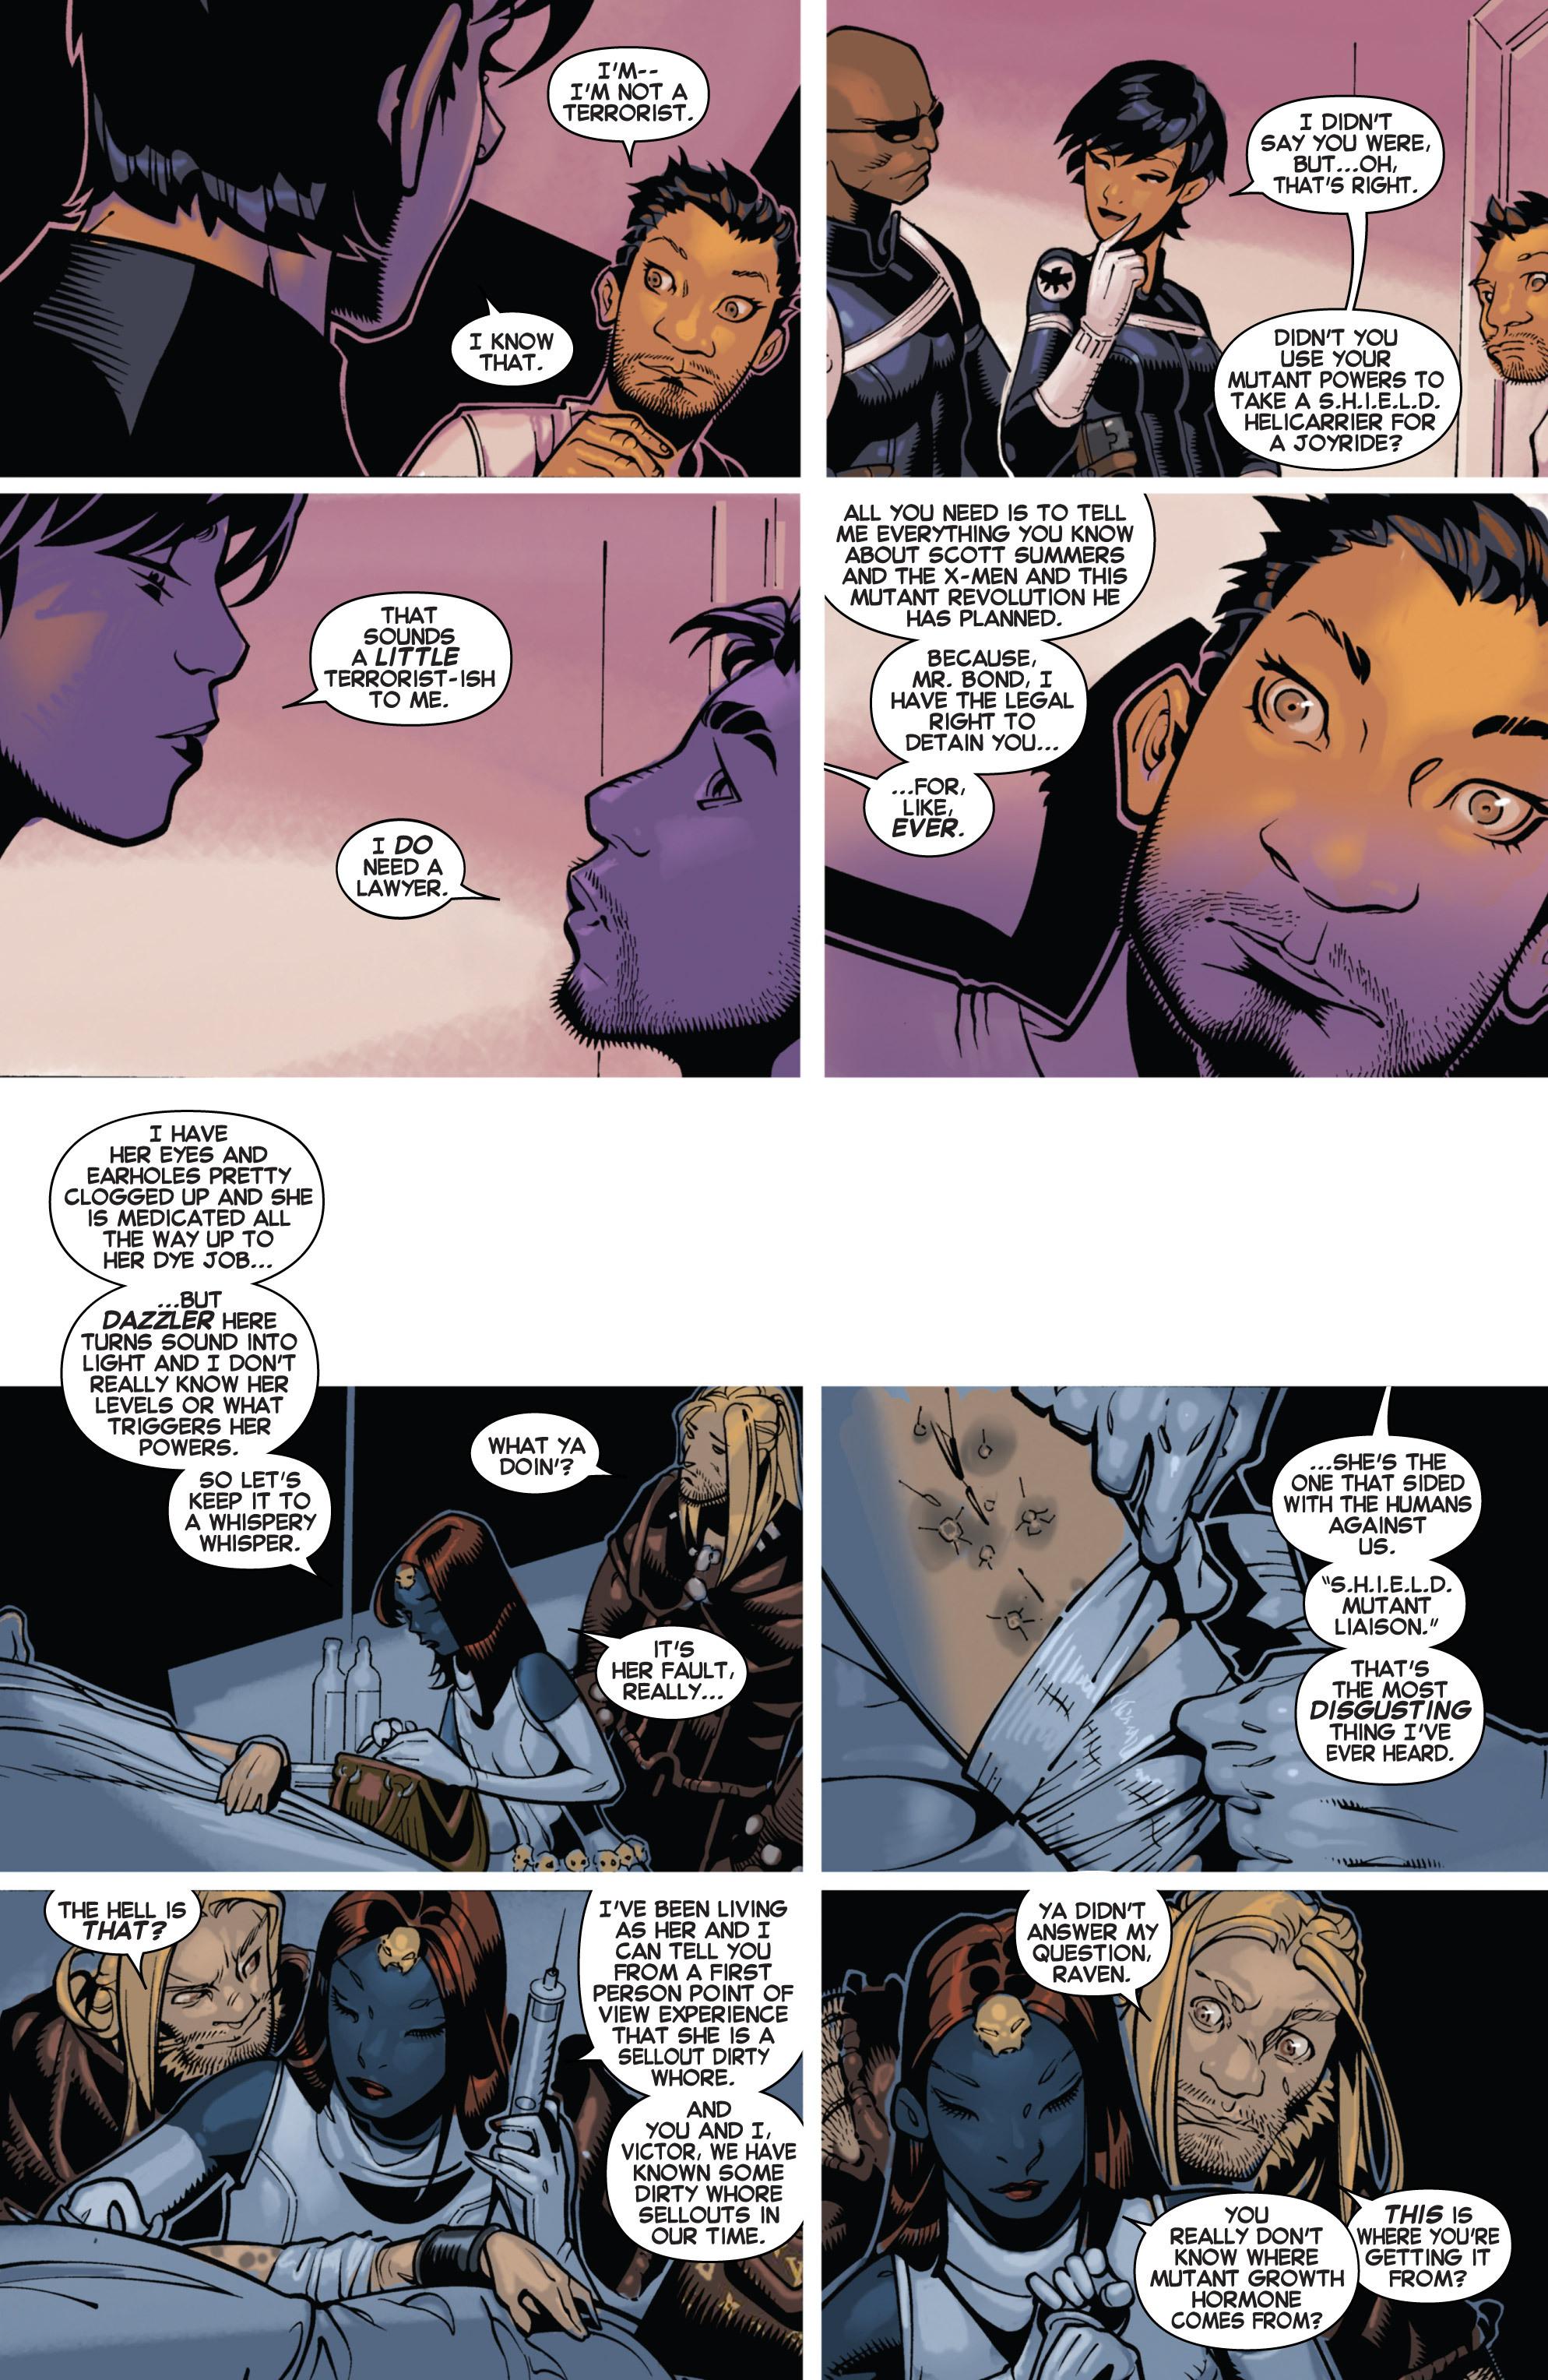 Read online Uncanny X-Men (2013) comic -  Issue # _TPB 4 - vs. S.H.I.E.L.D - 8